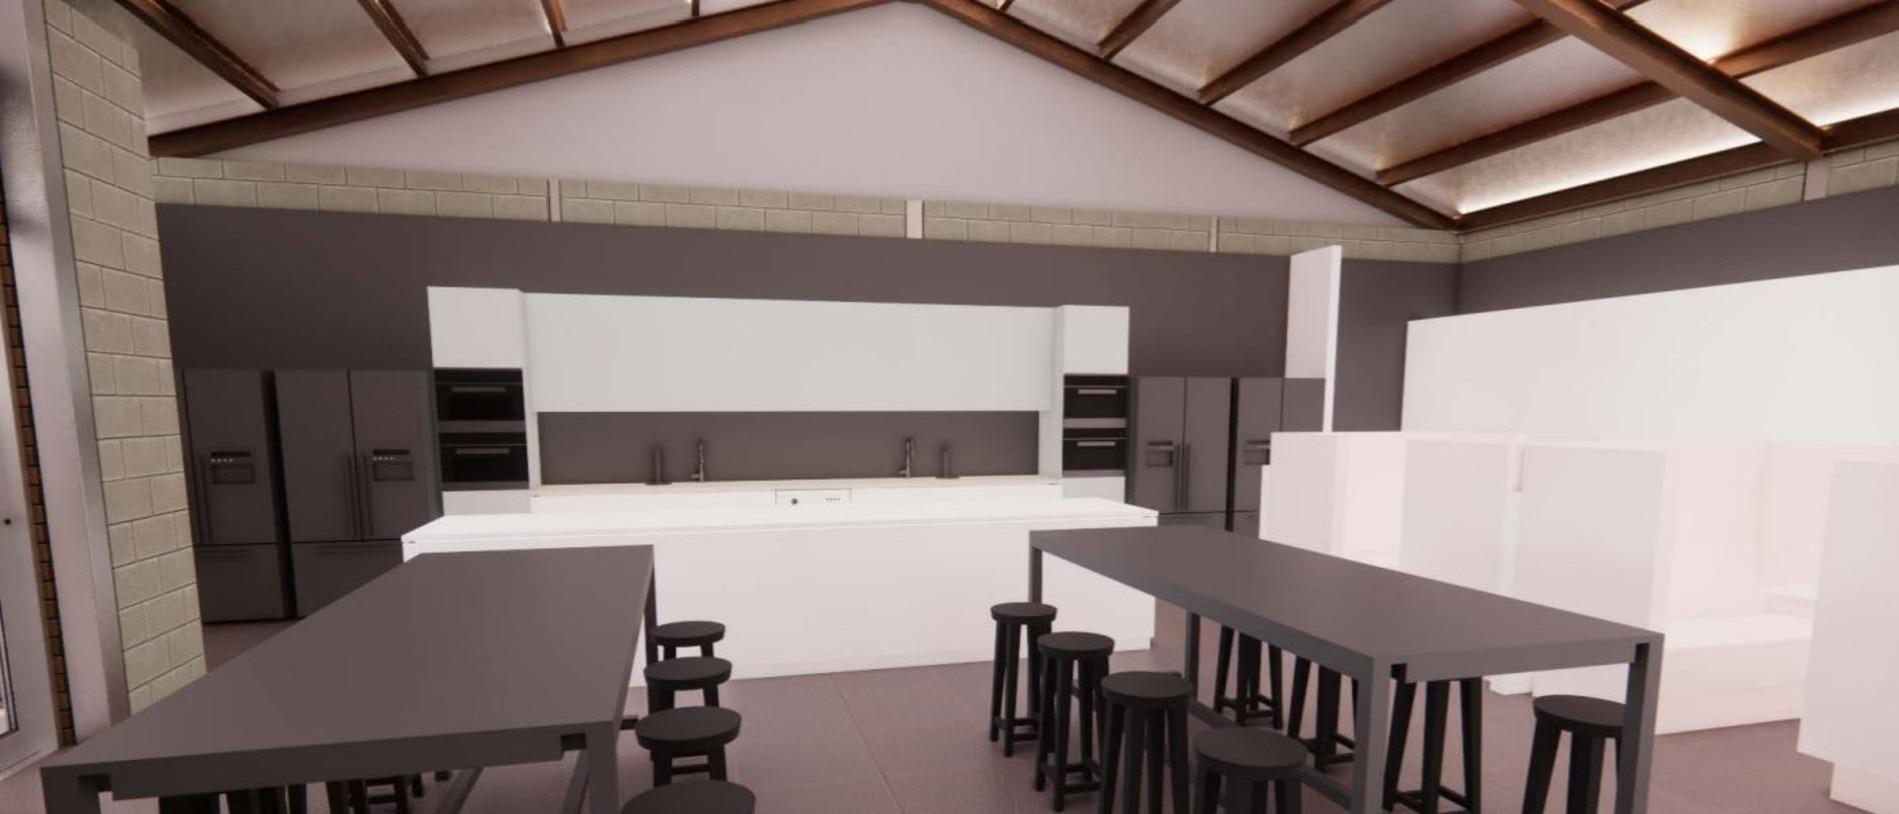 THE NETWORK: There are big plans proposed for former Avoca Aldi site on Bolewski St, Avoca, Bundaberg. Designs: Contributed.